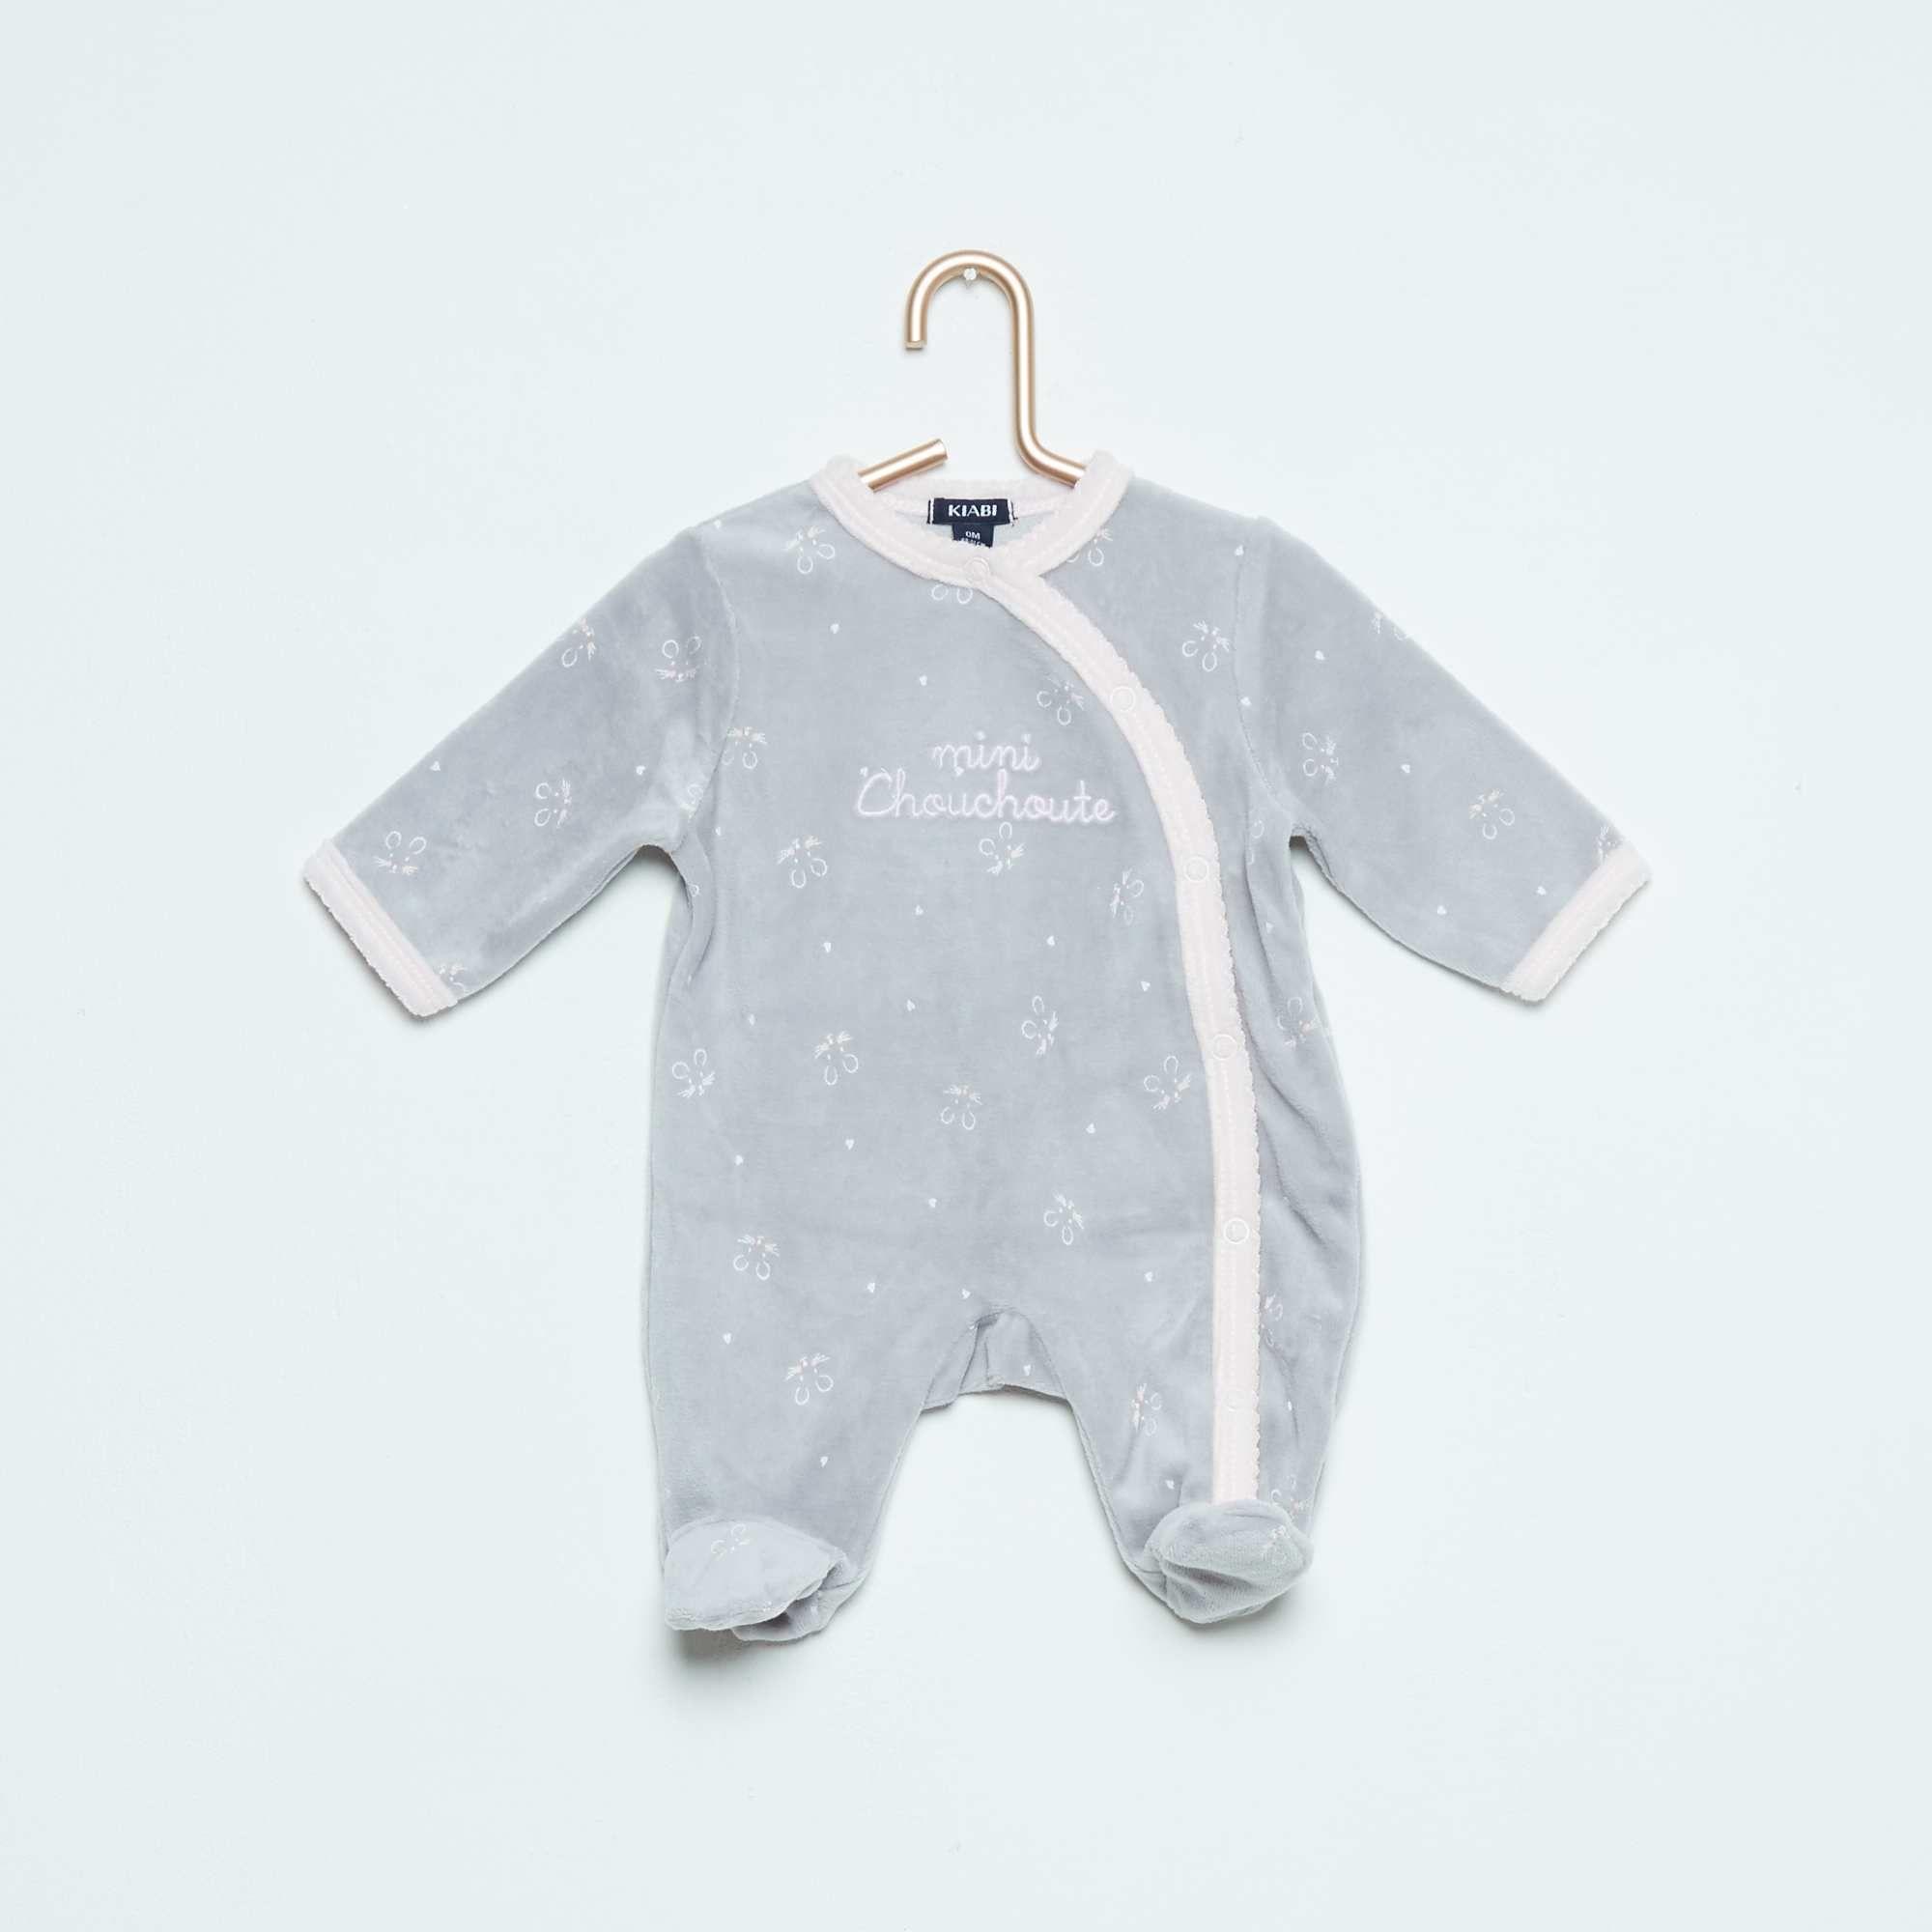 d6fb1de2baf7a Pyjama en velours imprimé étoile Bébé fille - Kiabi - 10